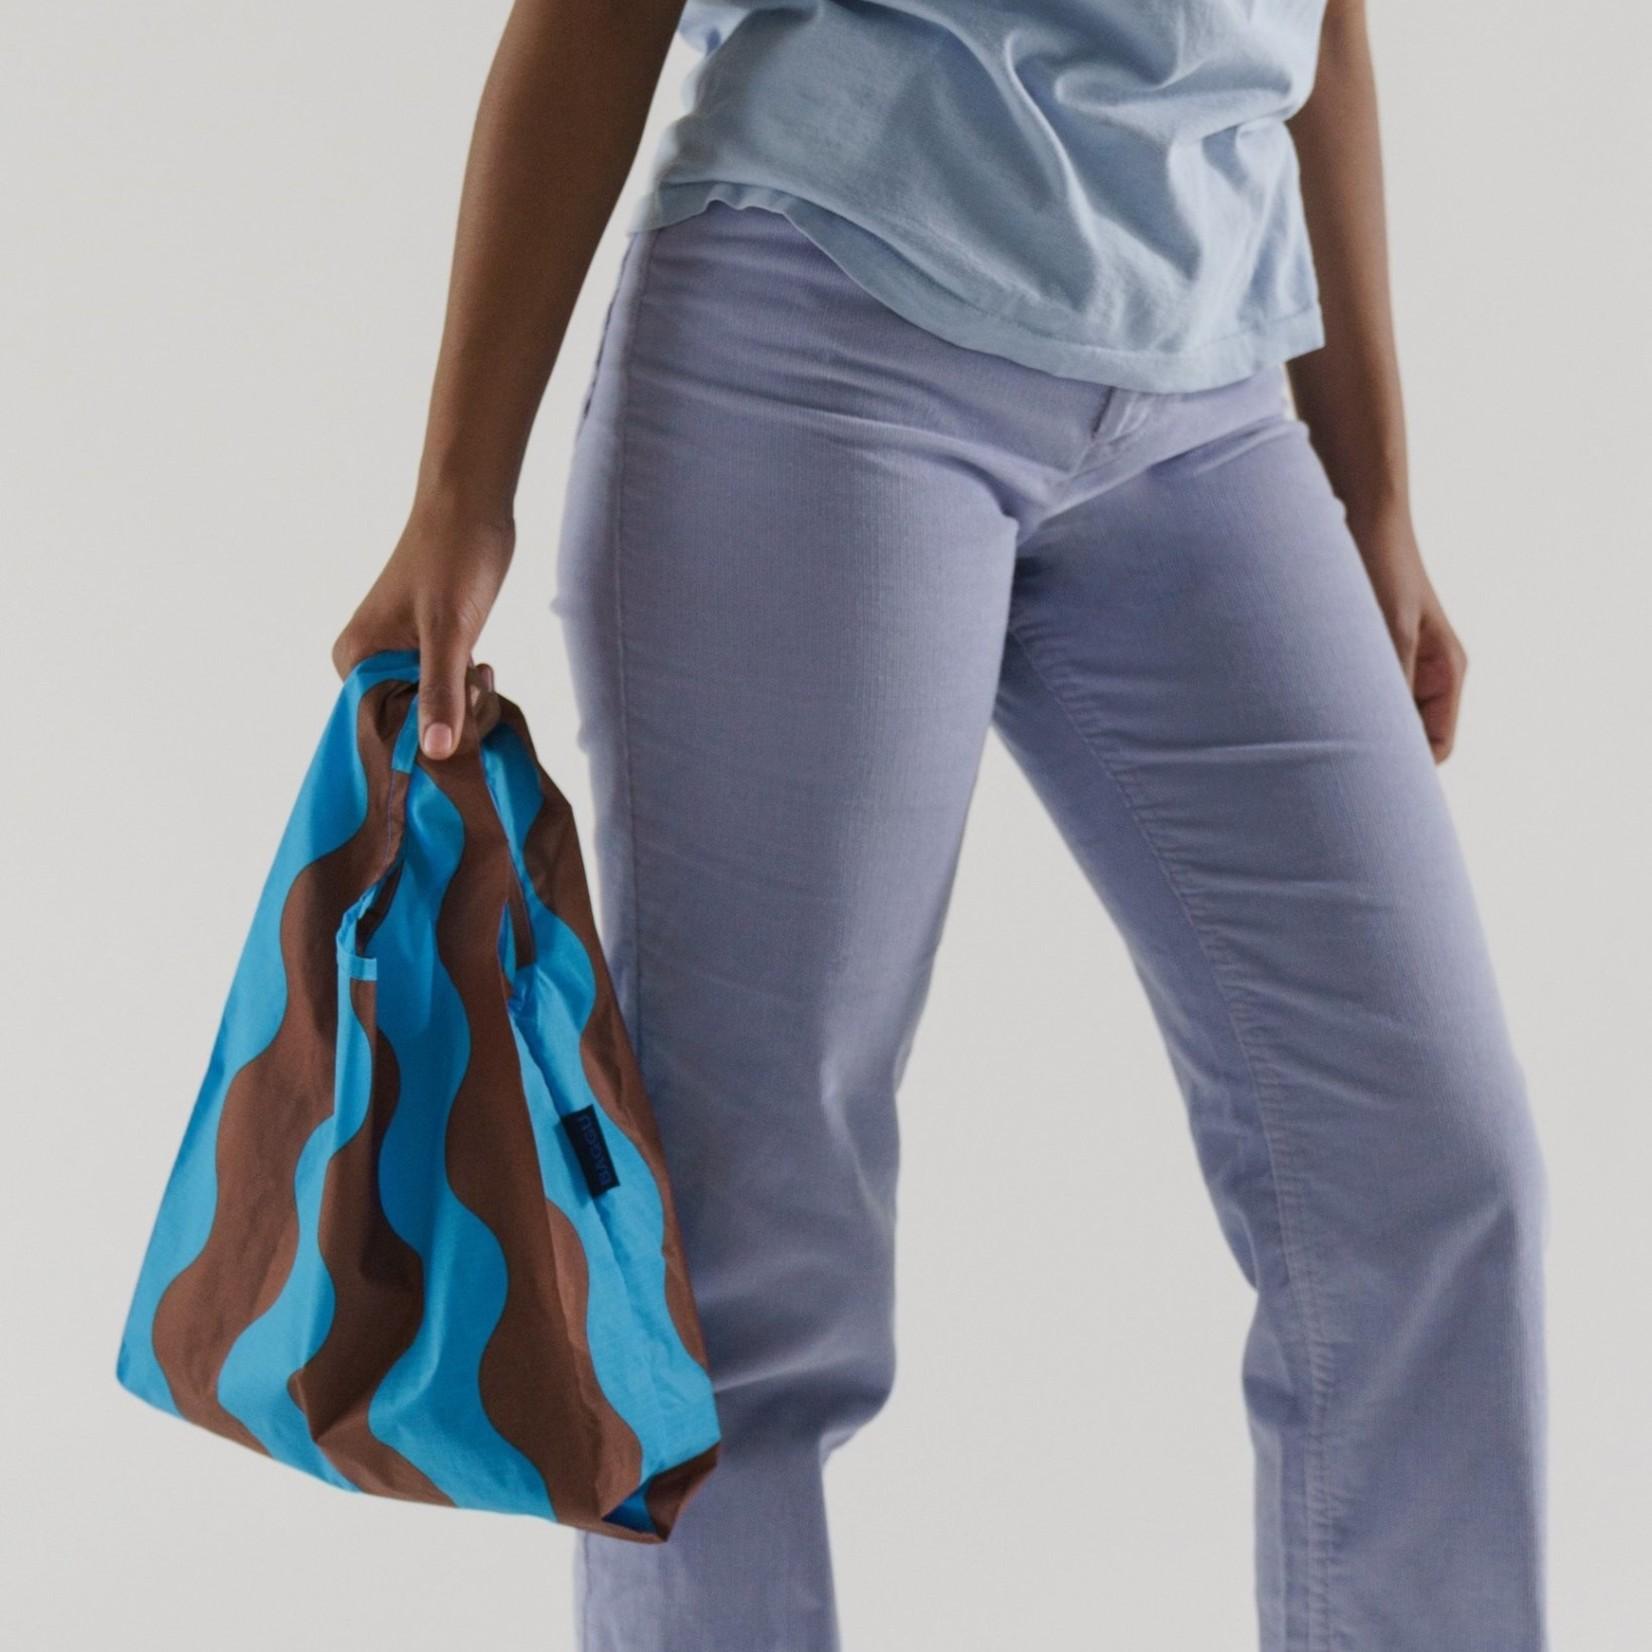 Baggu Baggu Reusable Bag Baby Teal and Brown Wavy Stripe